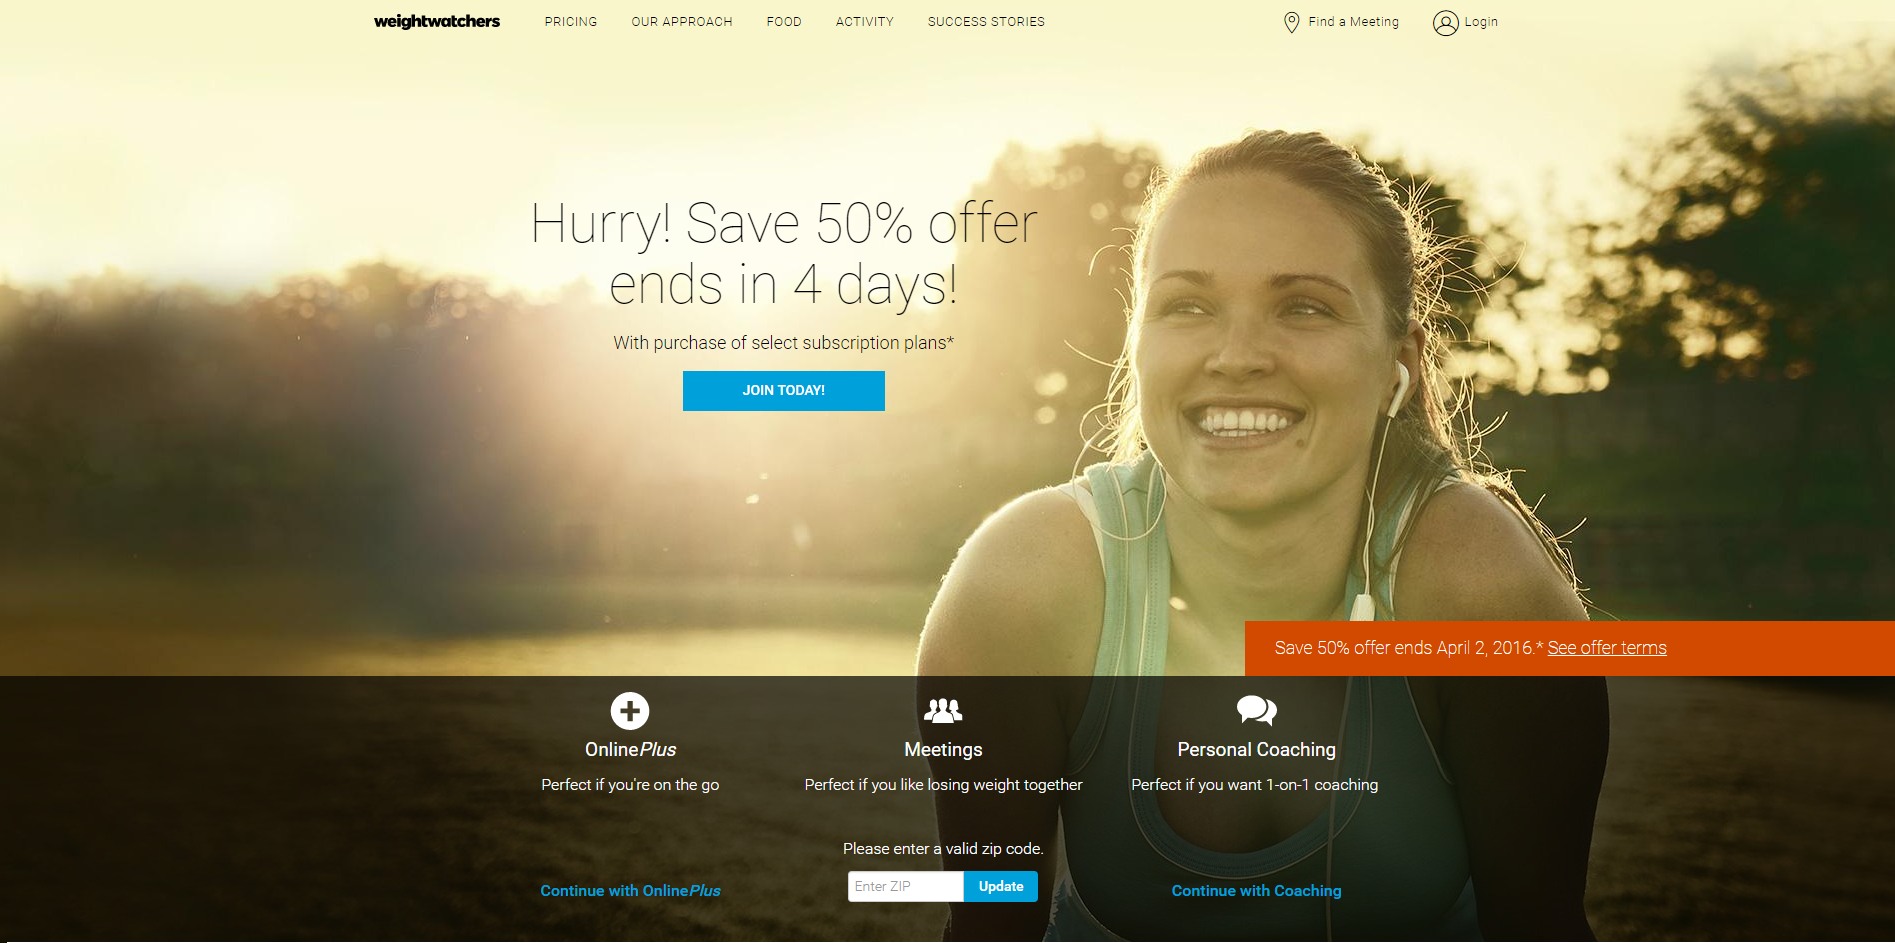 weightwatchers homepage